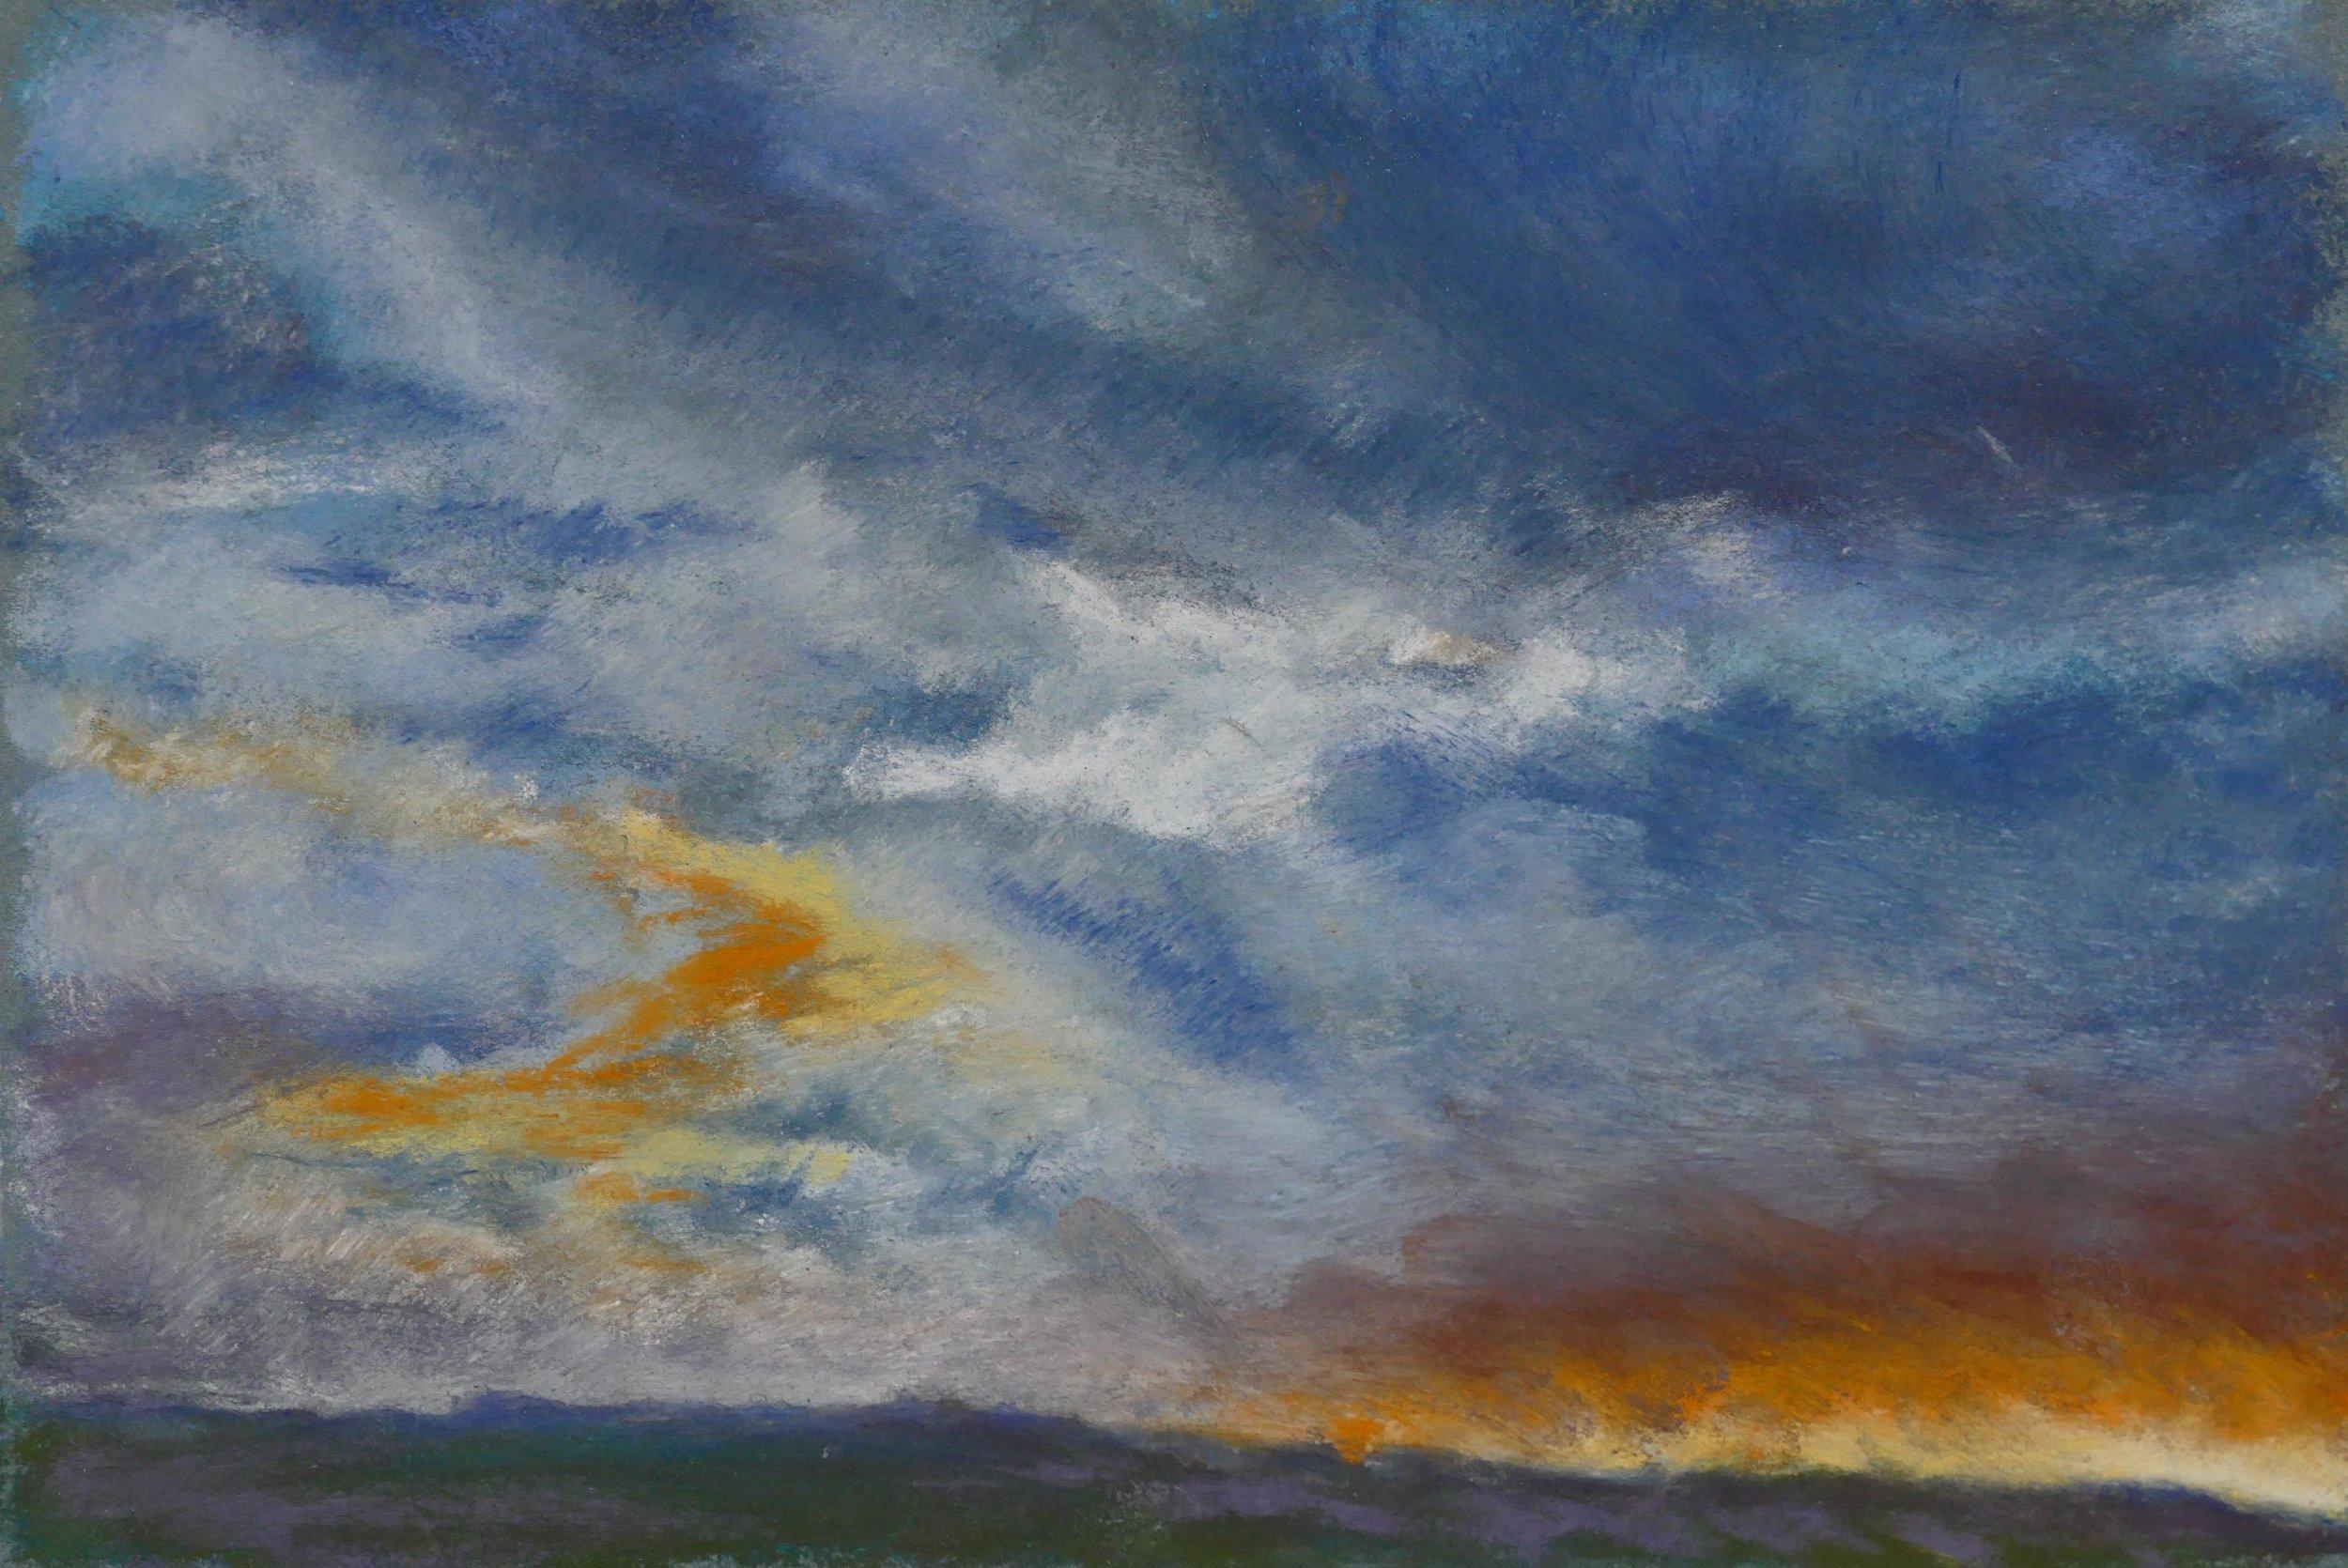 Print 15 - Stormy Sunset - Size: 359 x 234